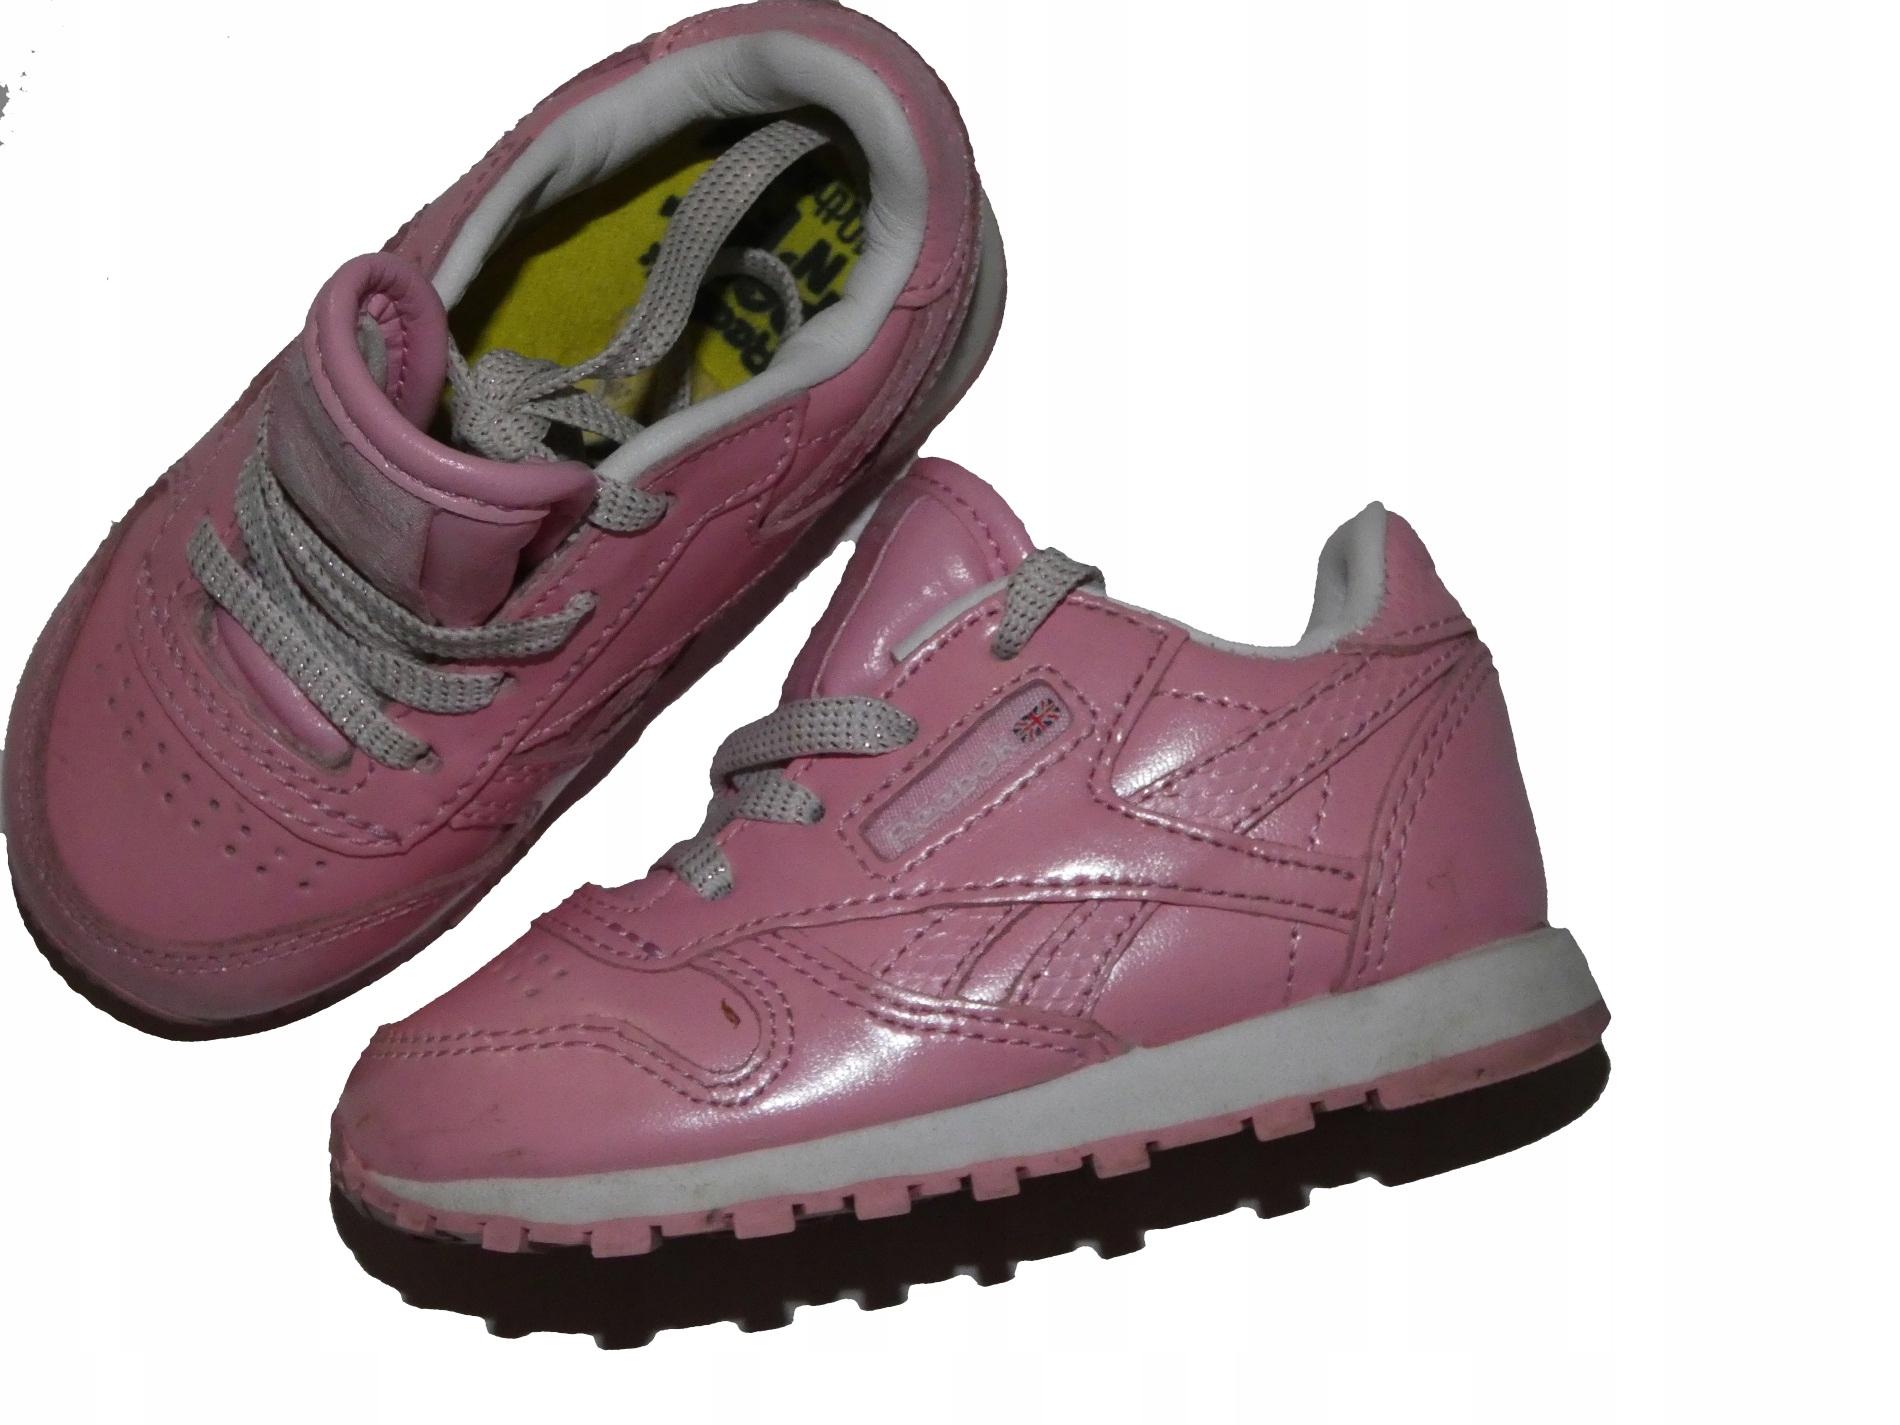 Reebok Adidasy roz 20